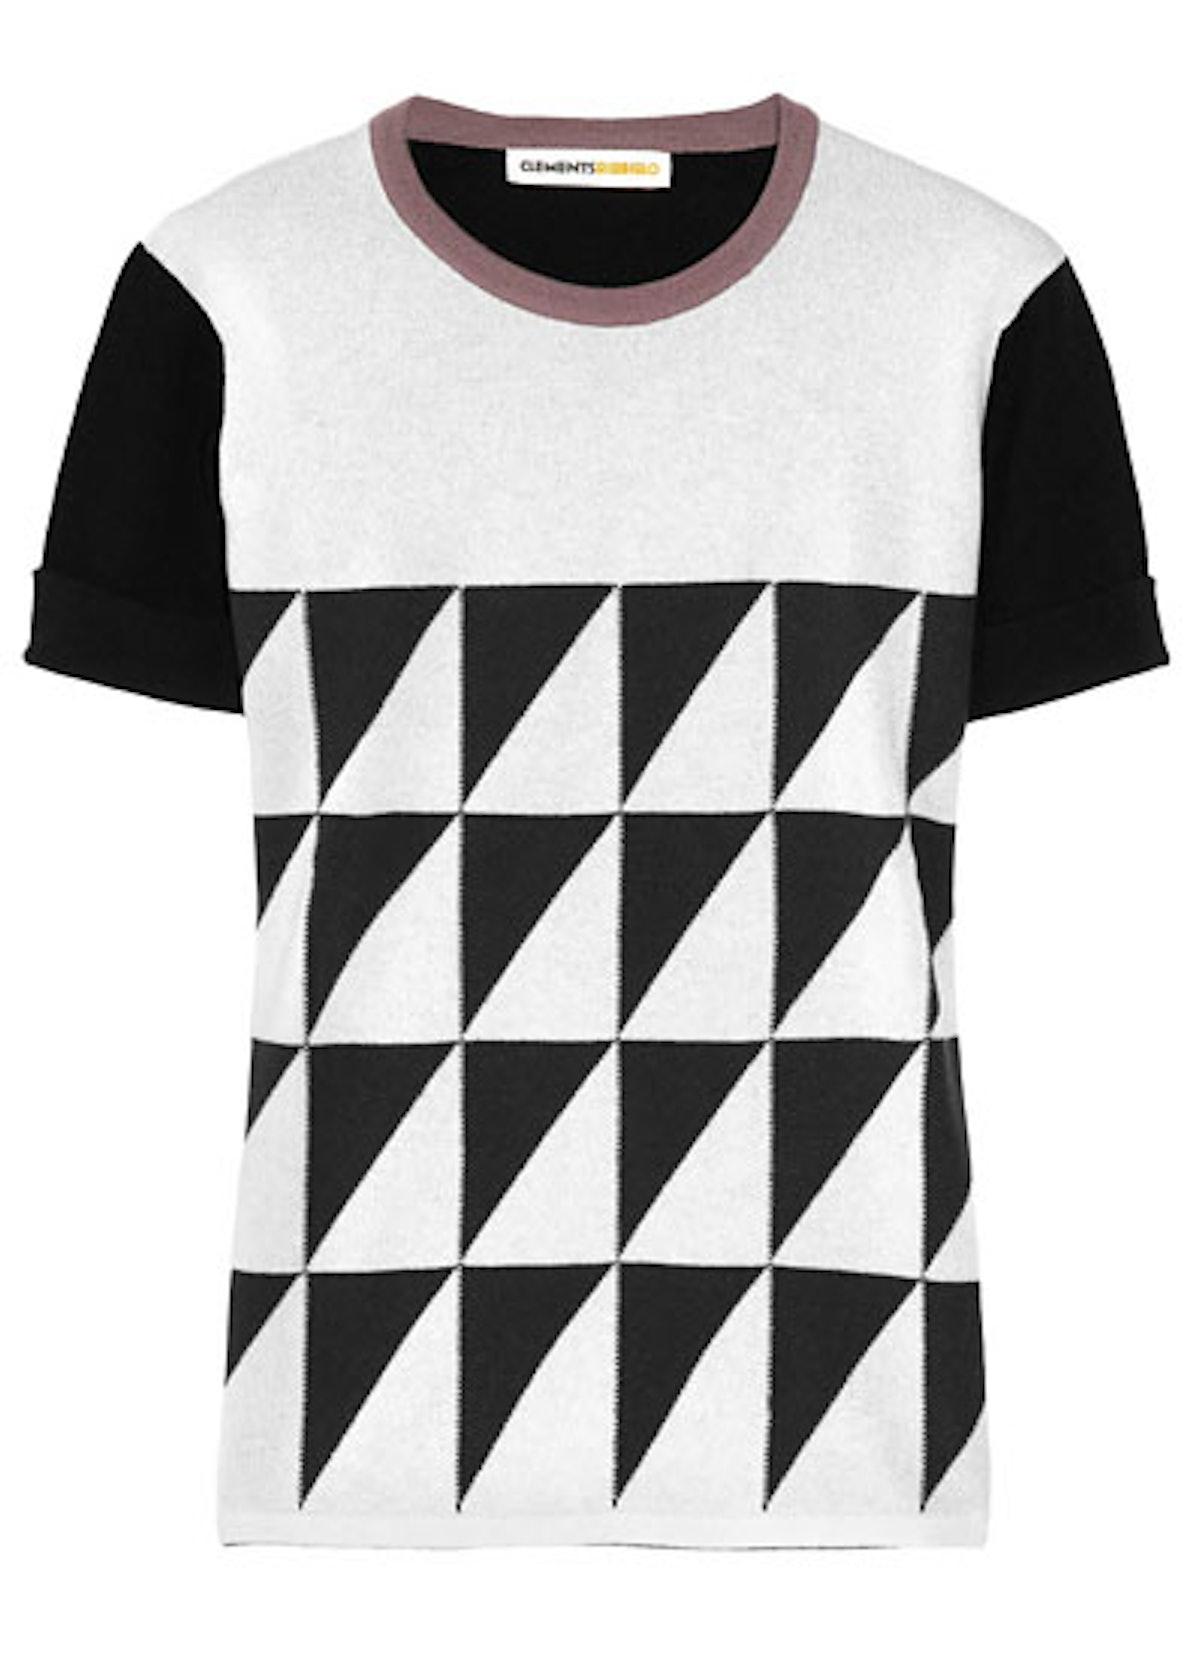 fass-graphic-knits-10-v.jpg